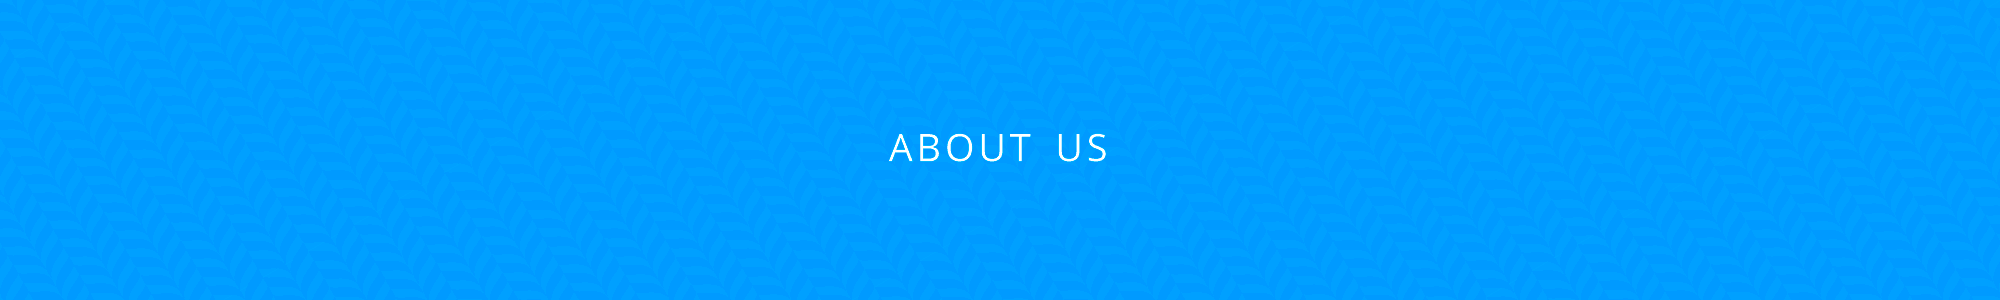 About Us Newandblue